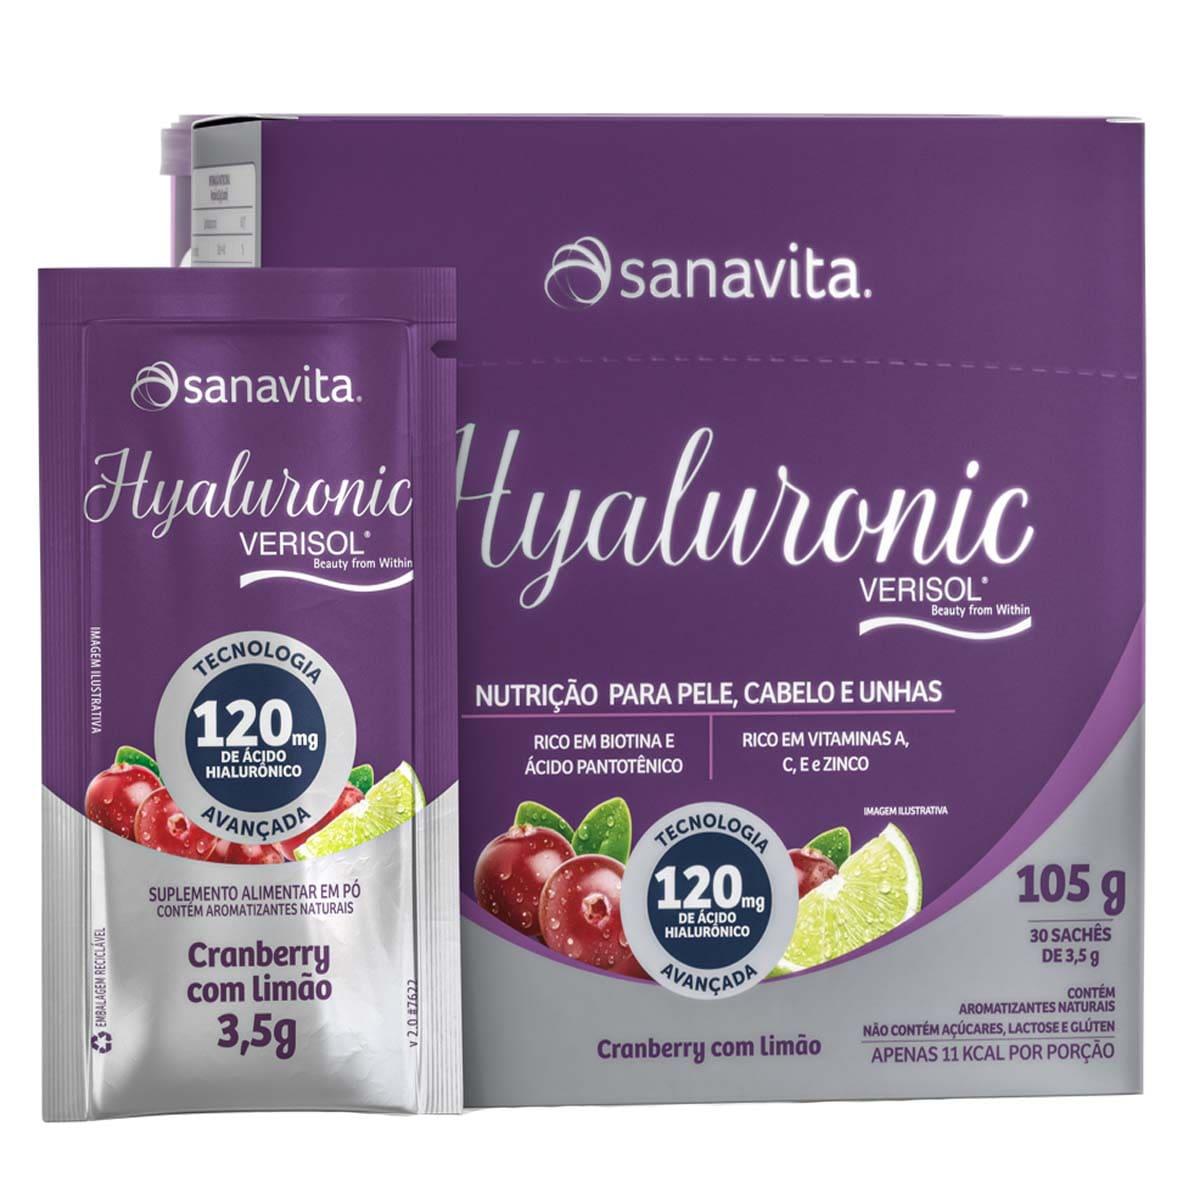 Hyaluronic Verisol  Cranberry com Limão Display 30 sachês